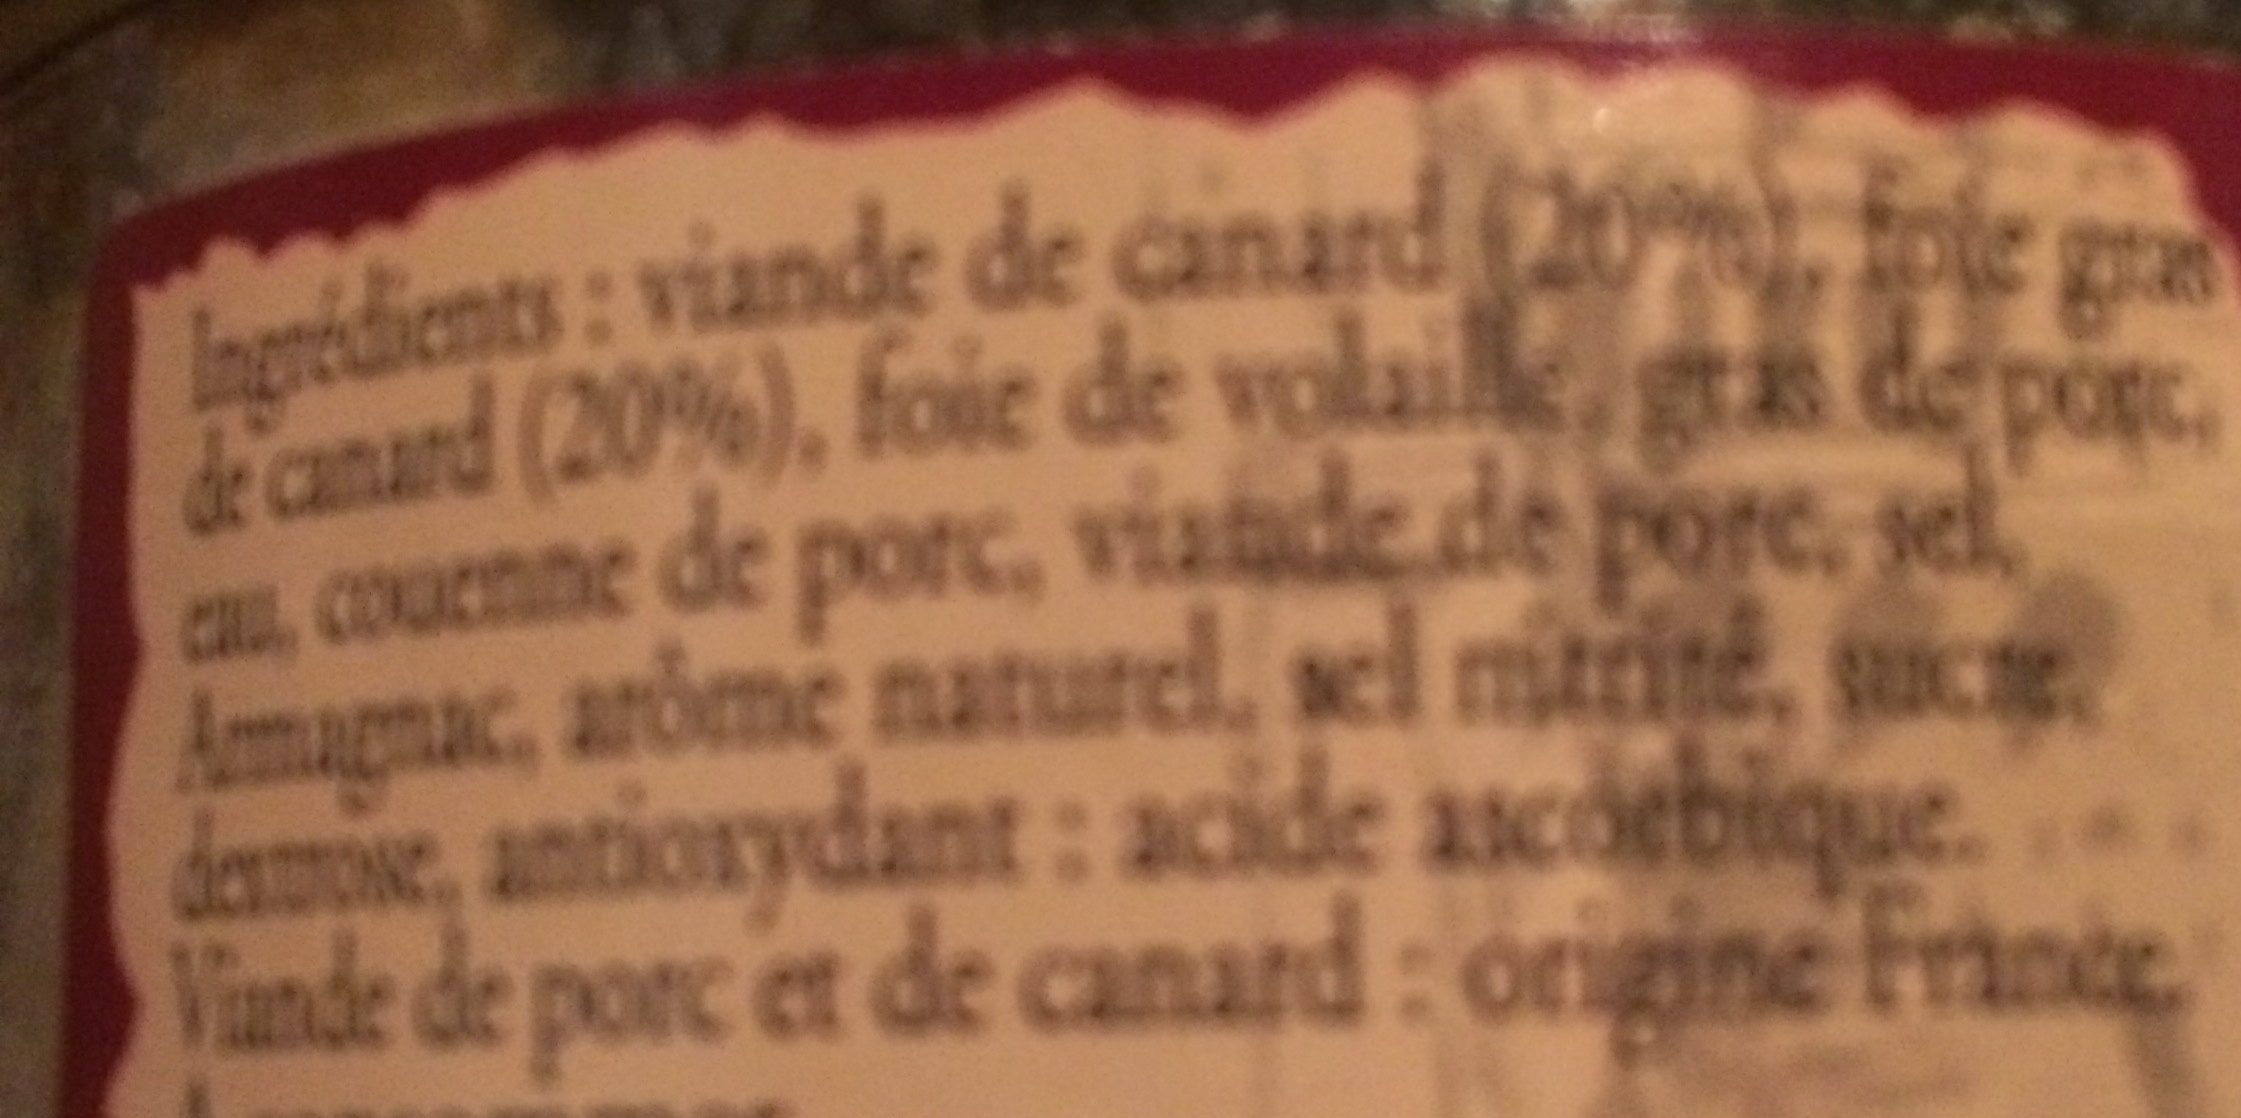 Terrine de Canard au Foie Gras - Ingredients - fr